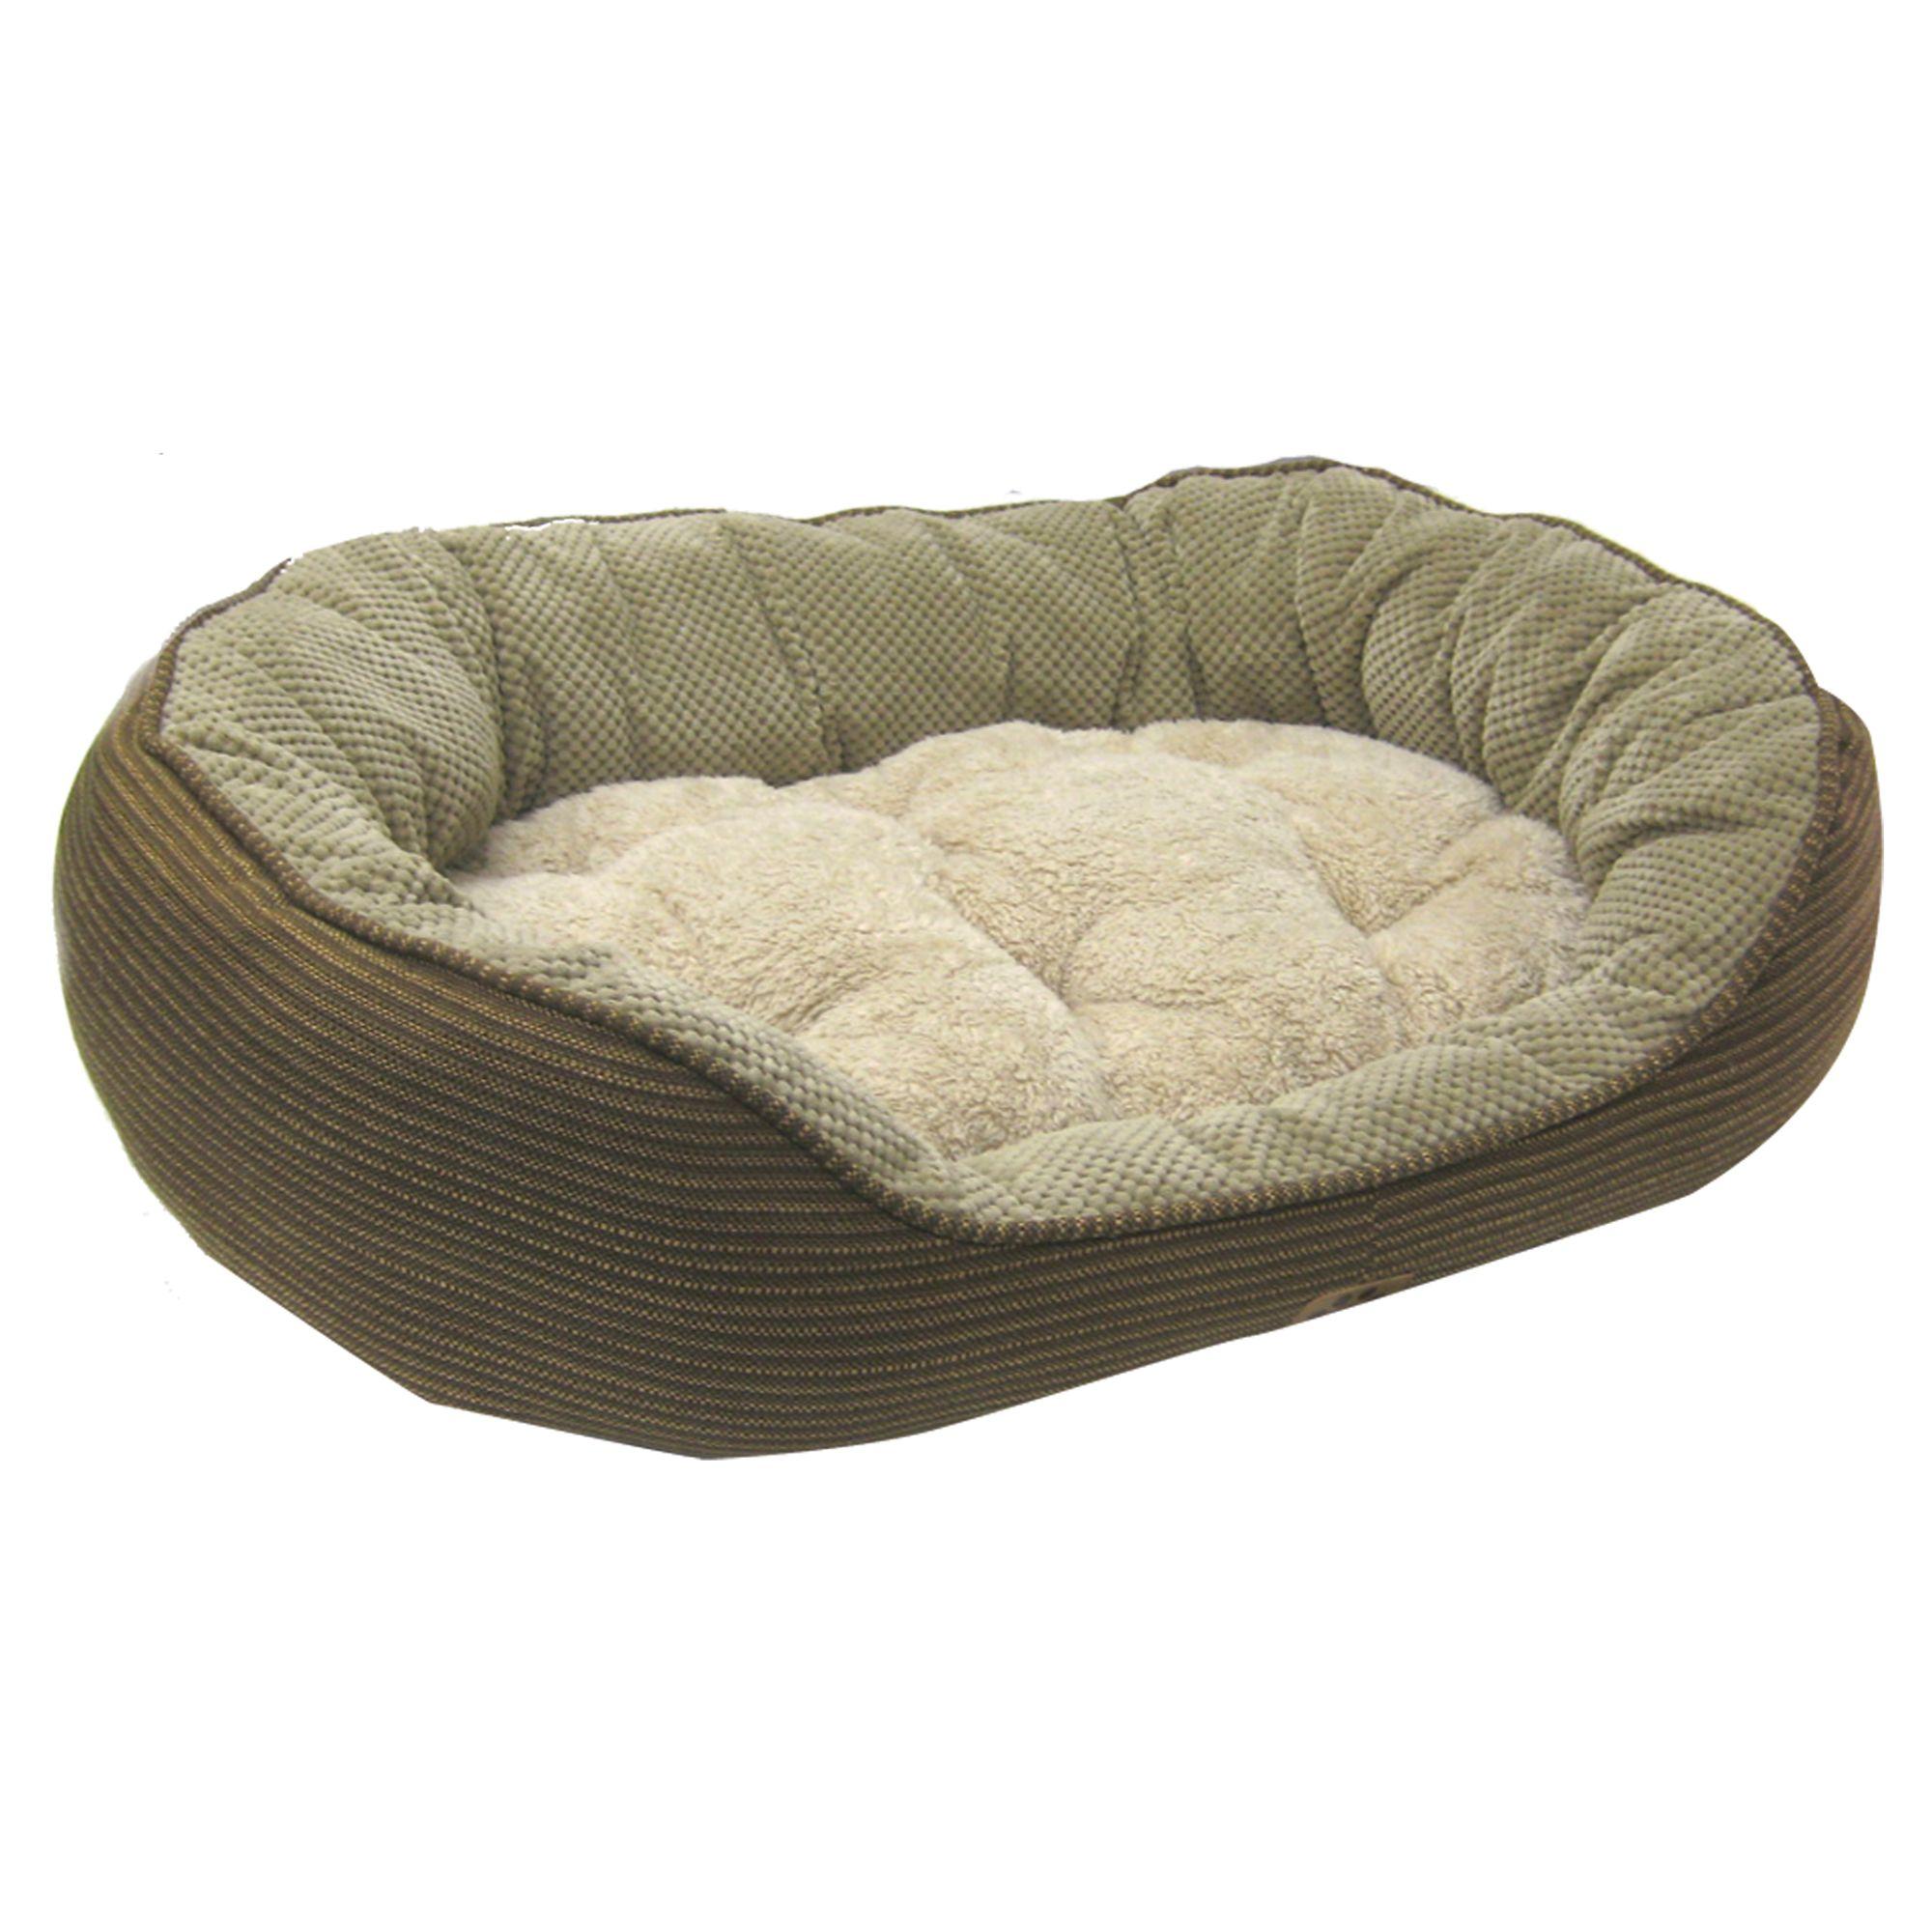 Precision Pet Daydreamer Pet Bed Size 32l X 25w X 10.5h Brown